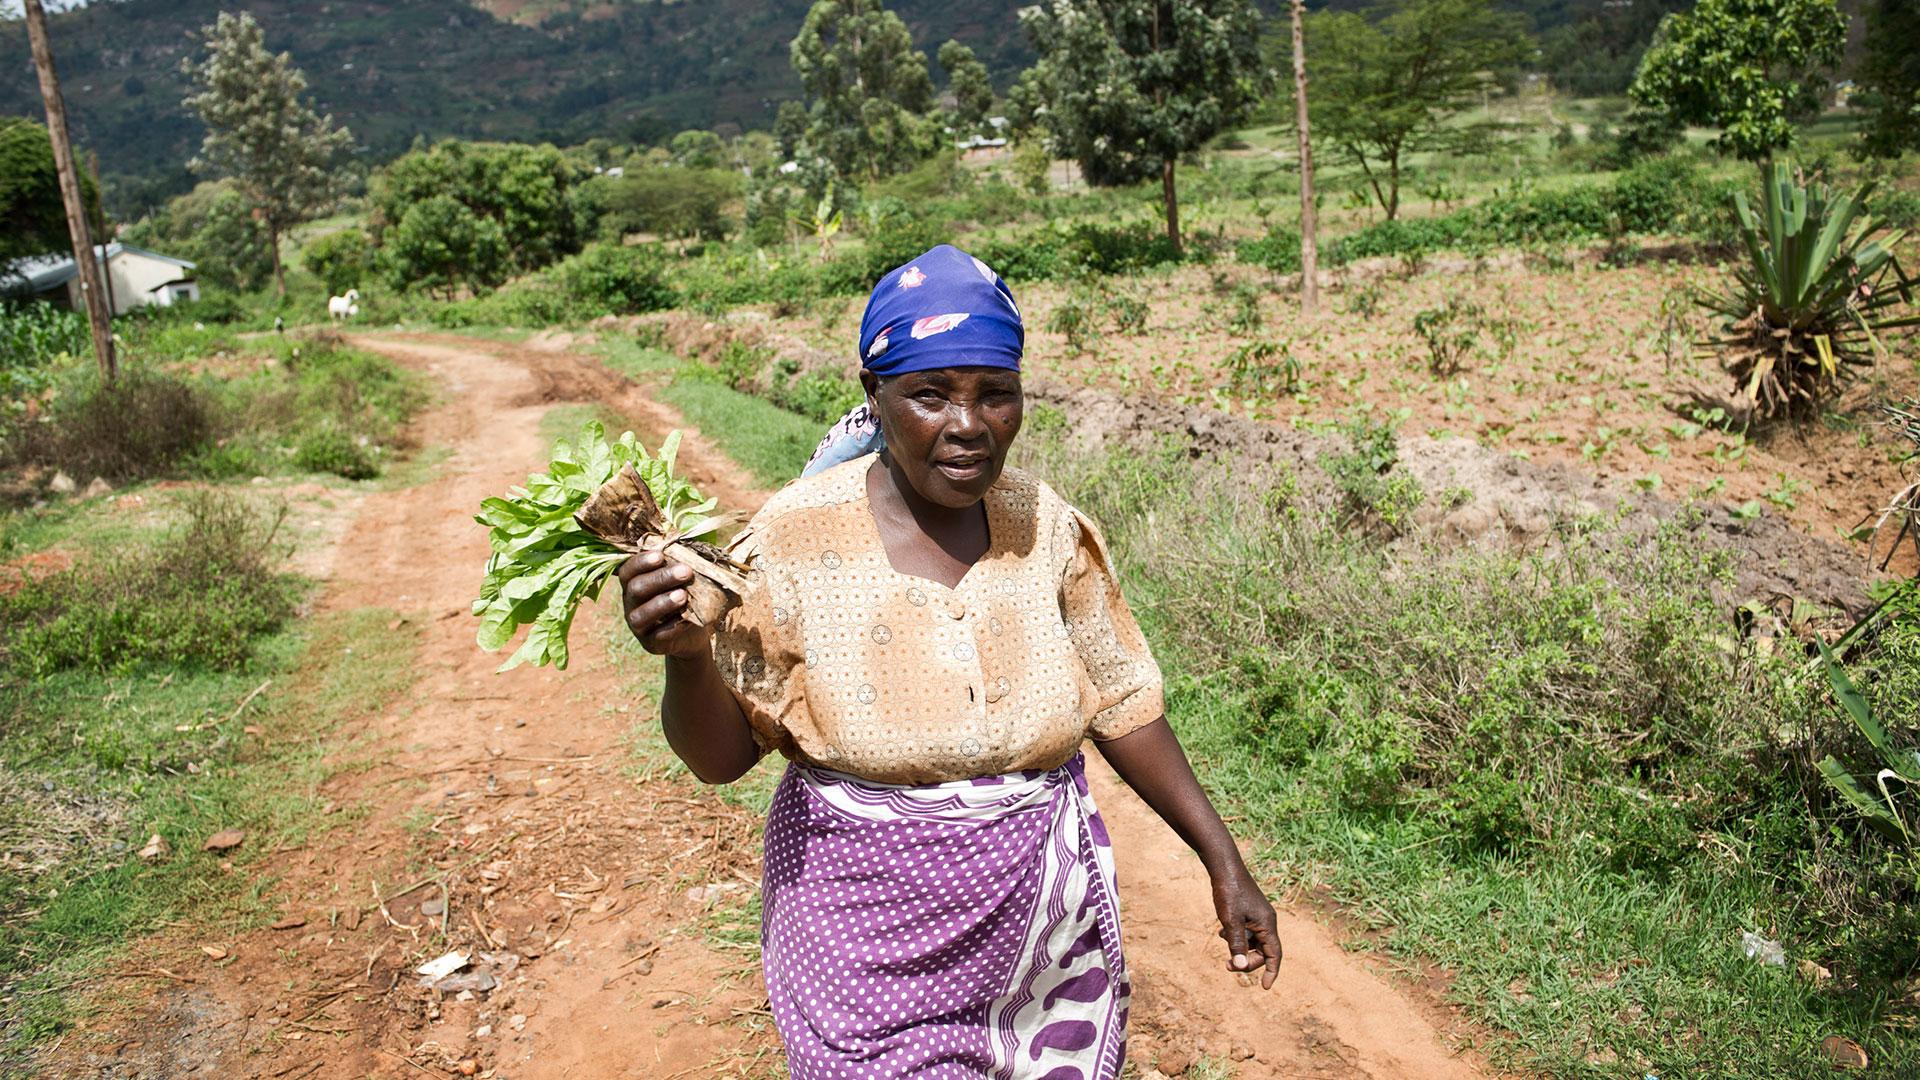 A female African farmer holding a crop sample